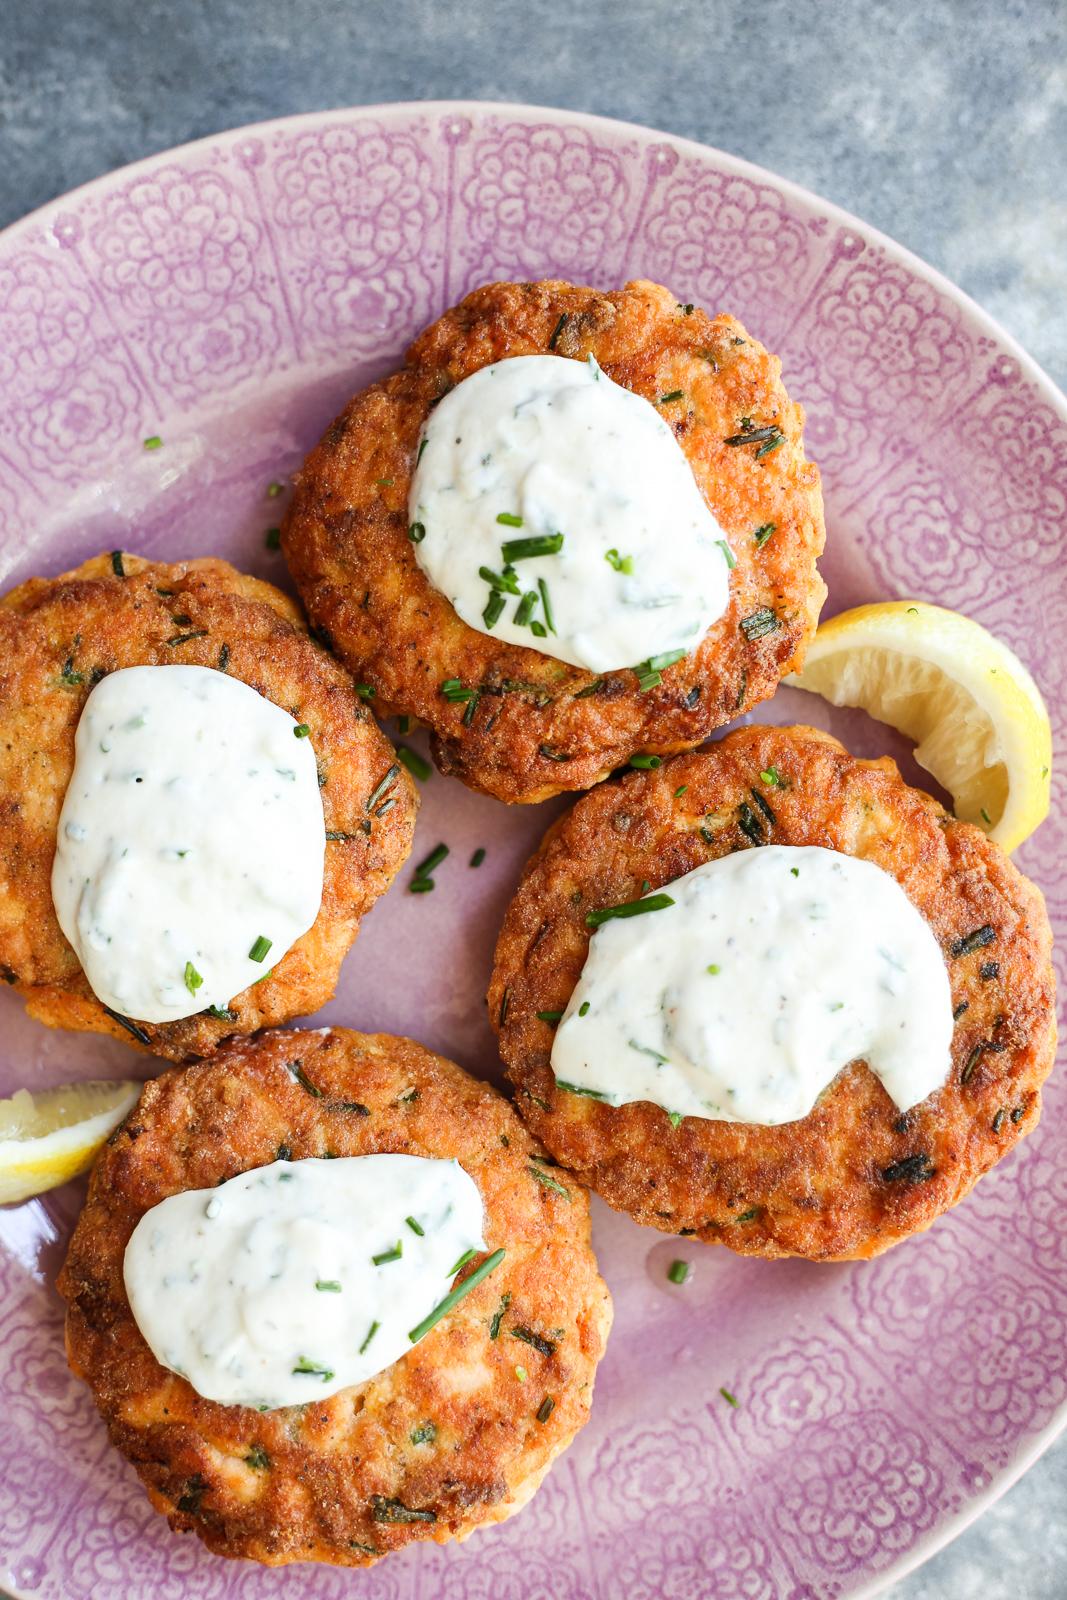 sour cream and onion salmon burgers